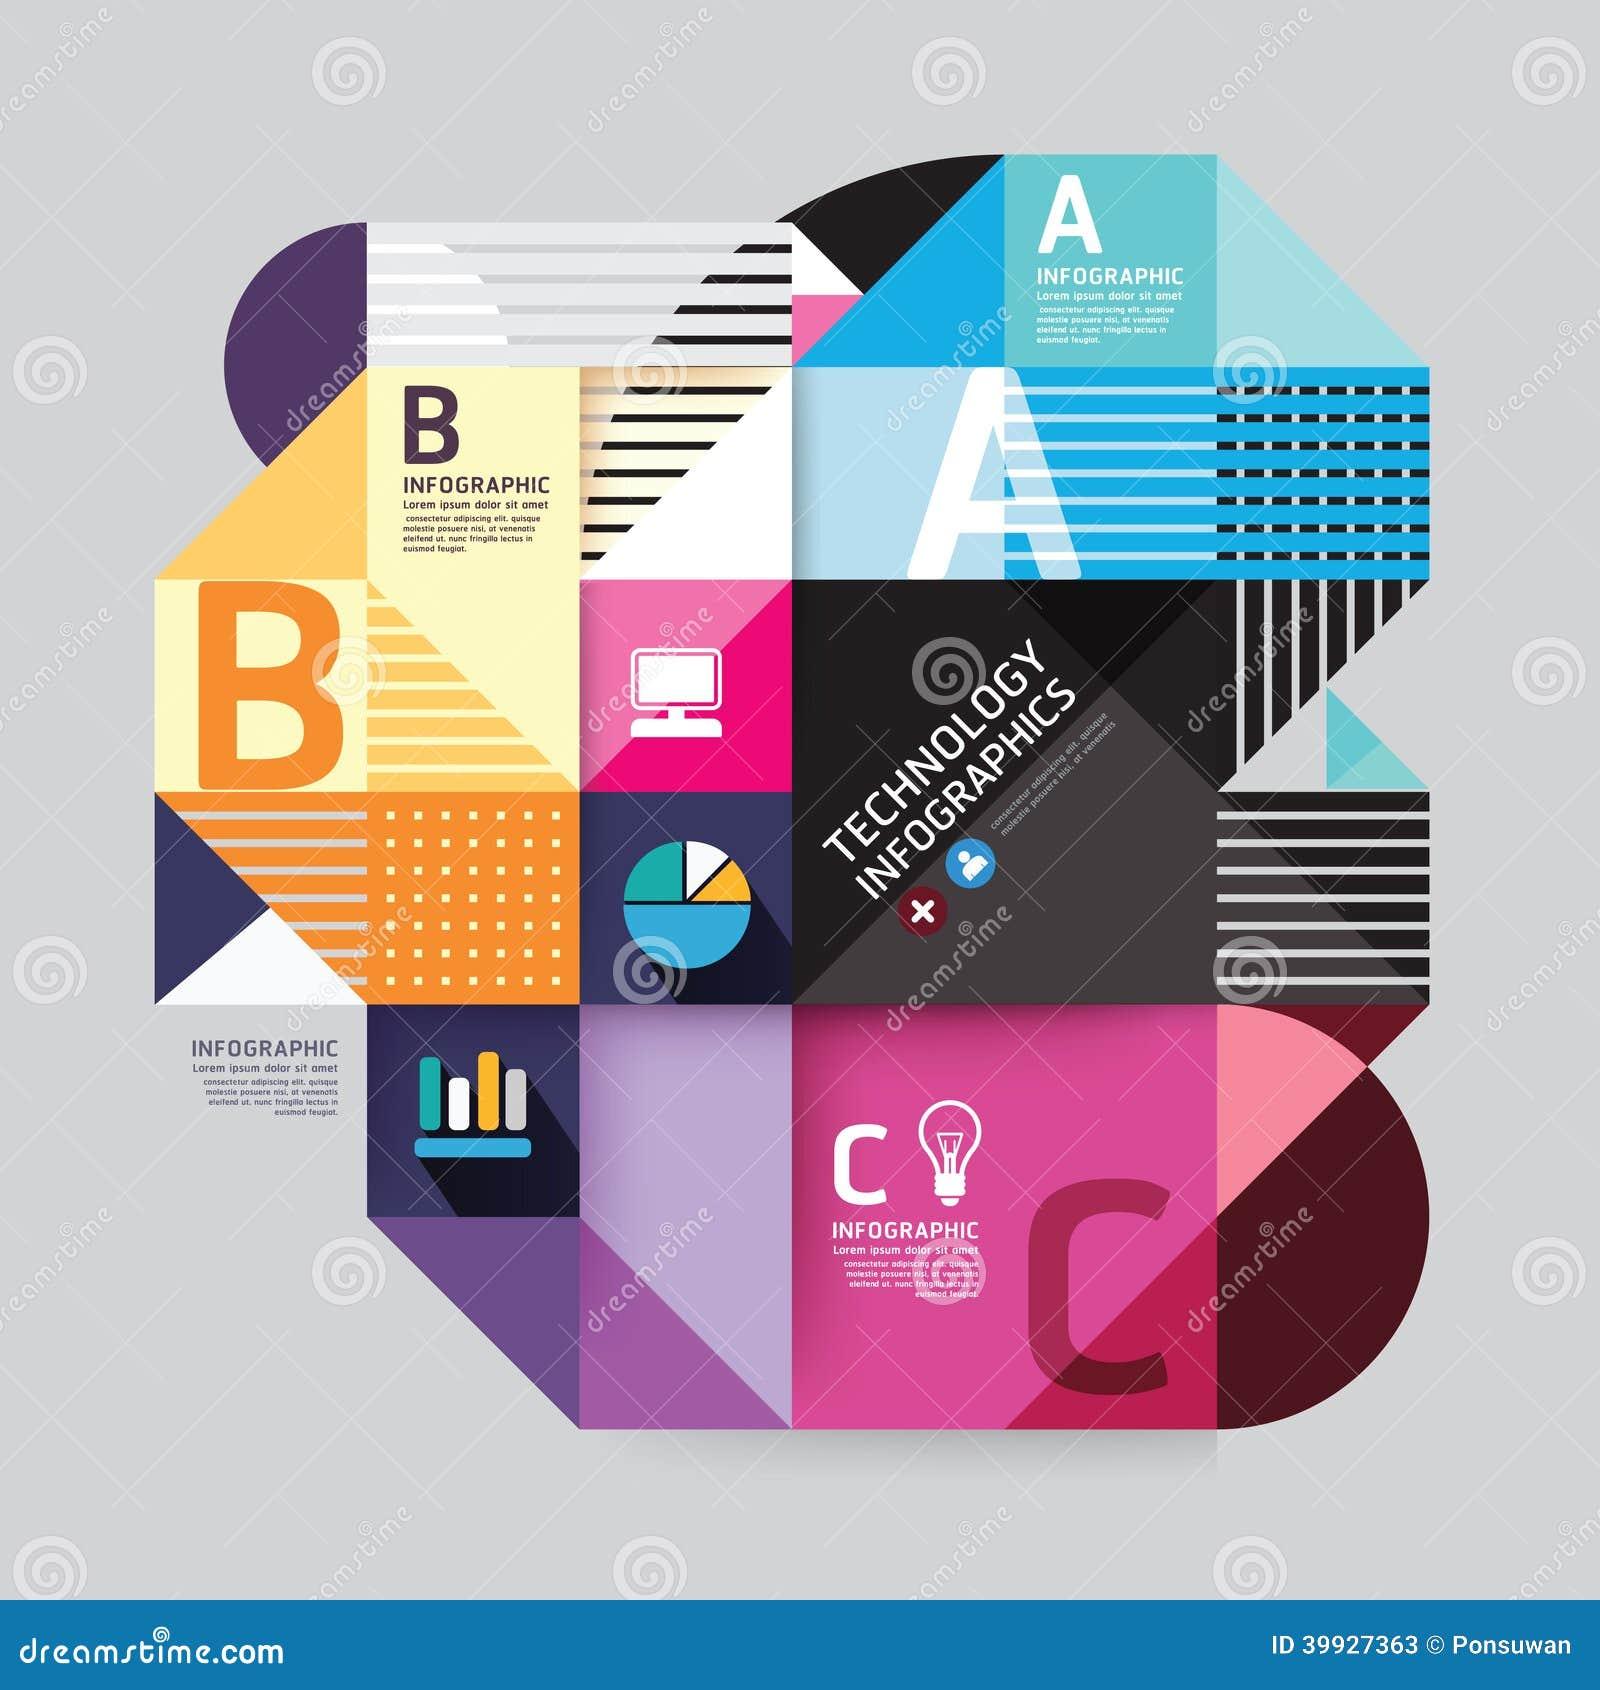 Modern Design Minimal Style Infographic Template. Stock ...